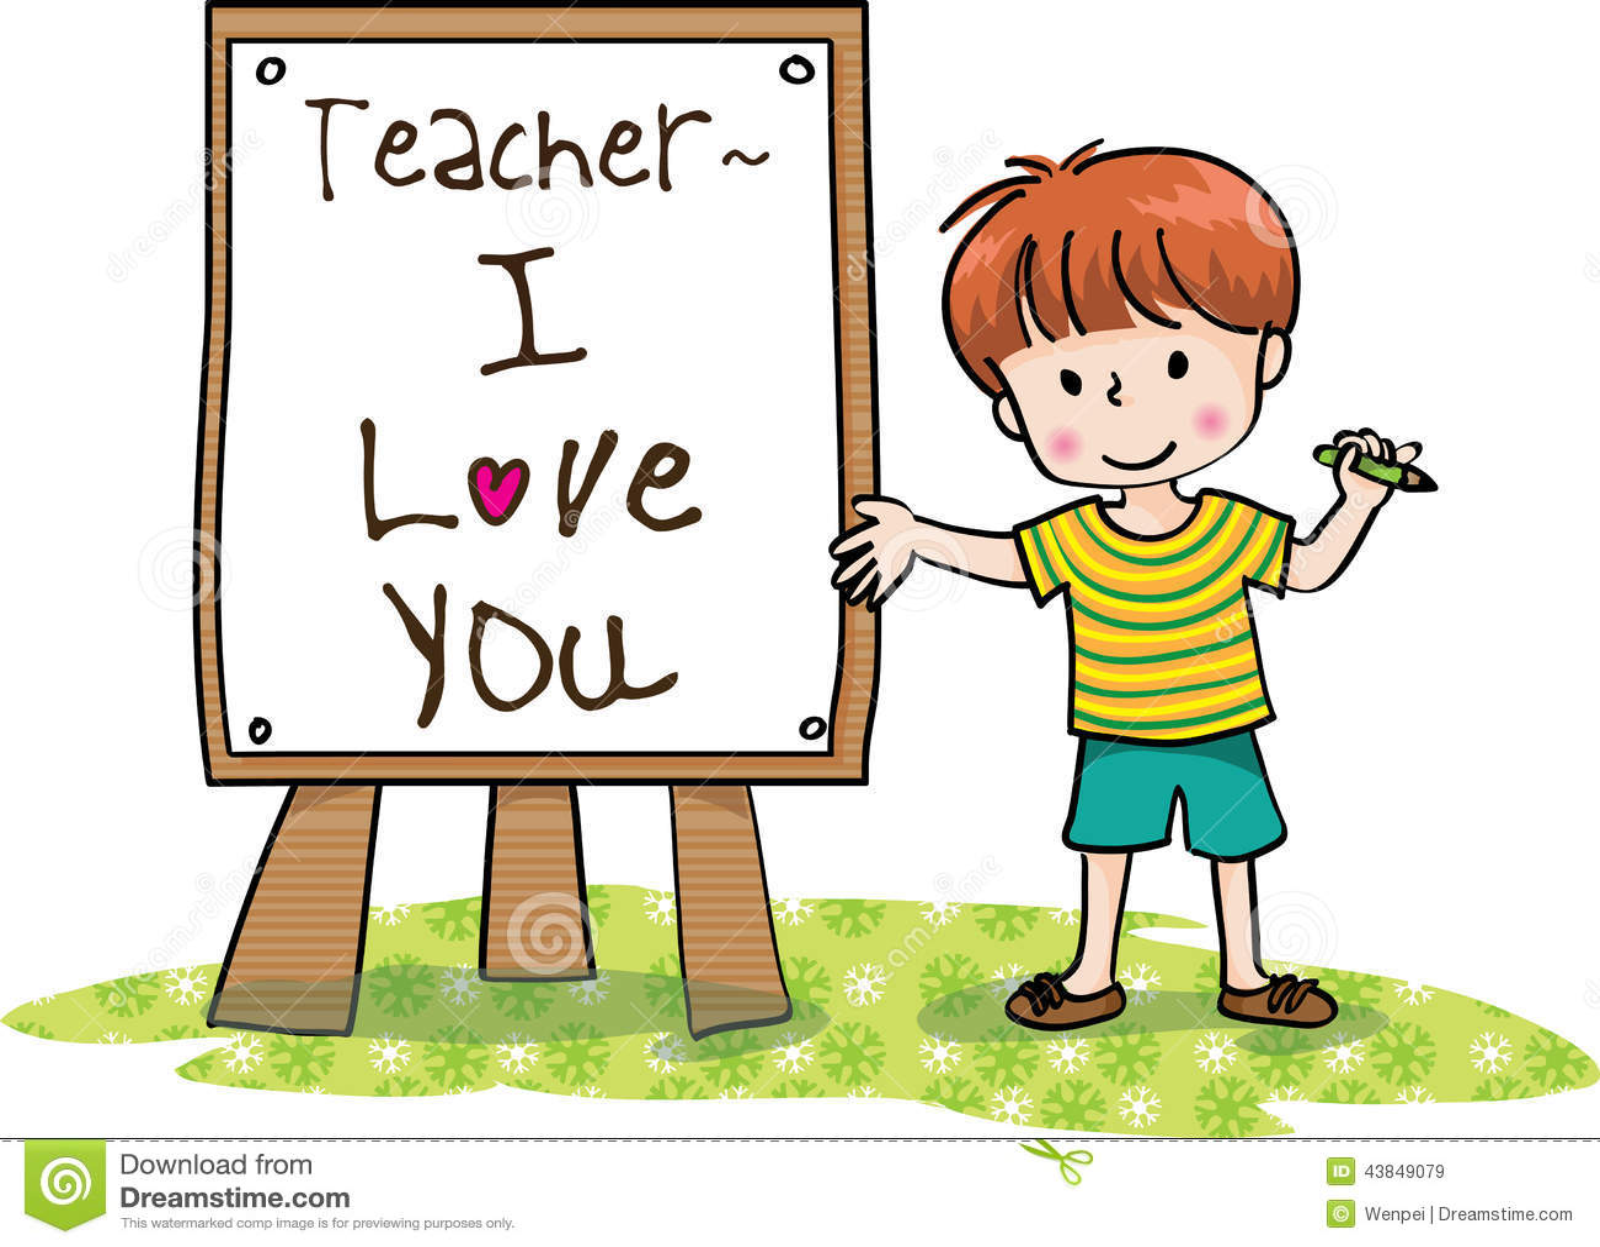 clipart teachers day - photo #11